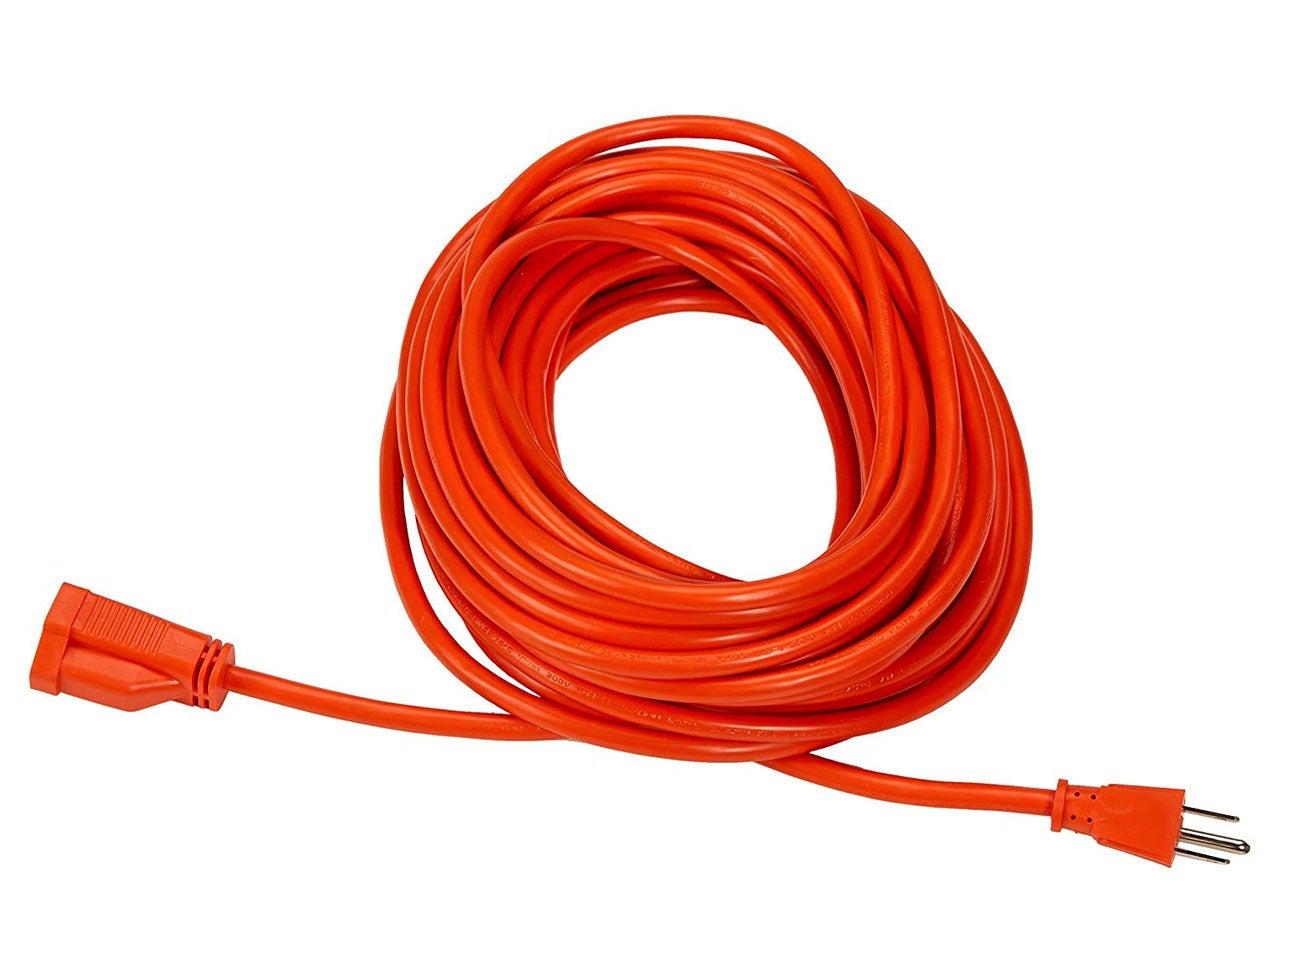 AmazonBasics 16/3 Vinyl Outdoor Extension Cord   Orange, 50-Foot